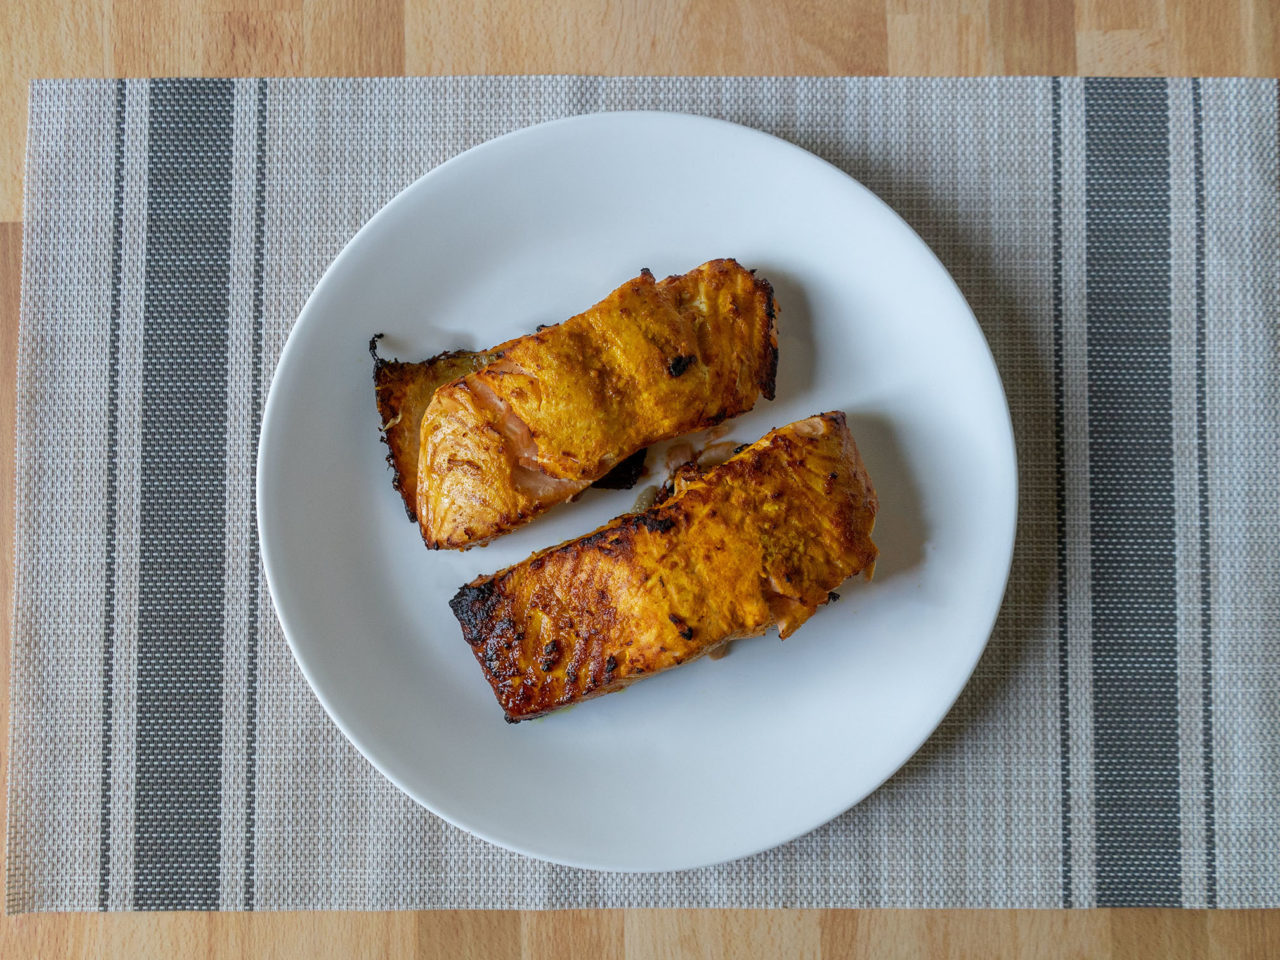 Air fried tandoori style salmon